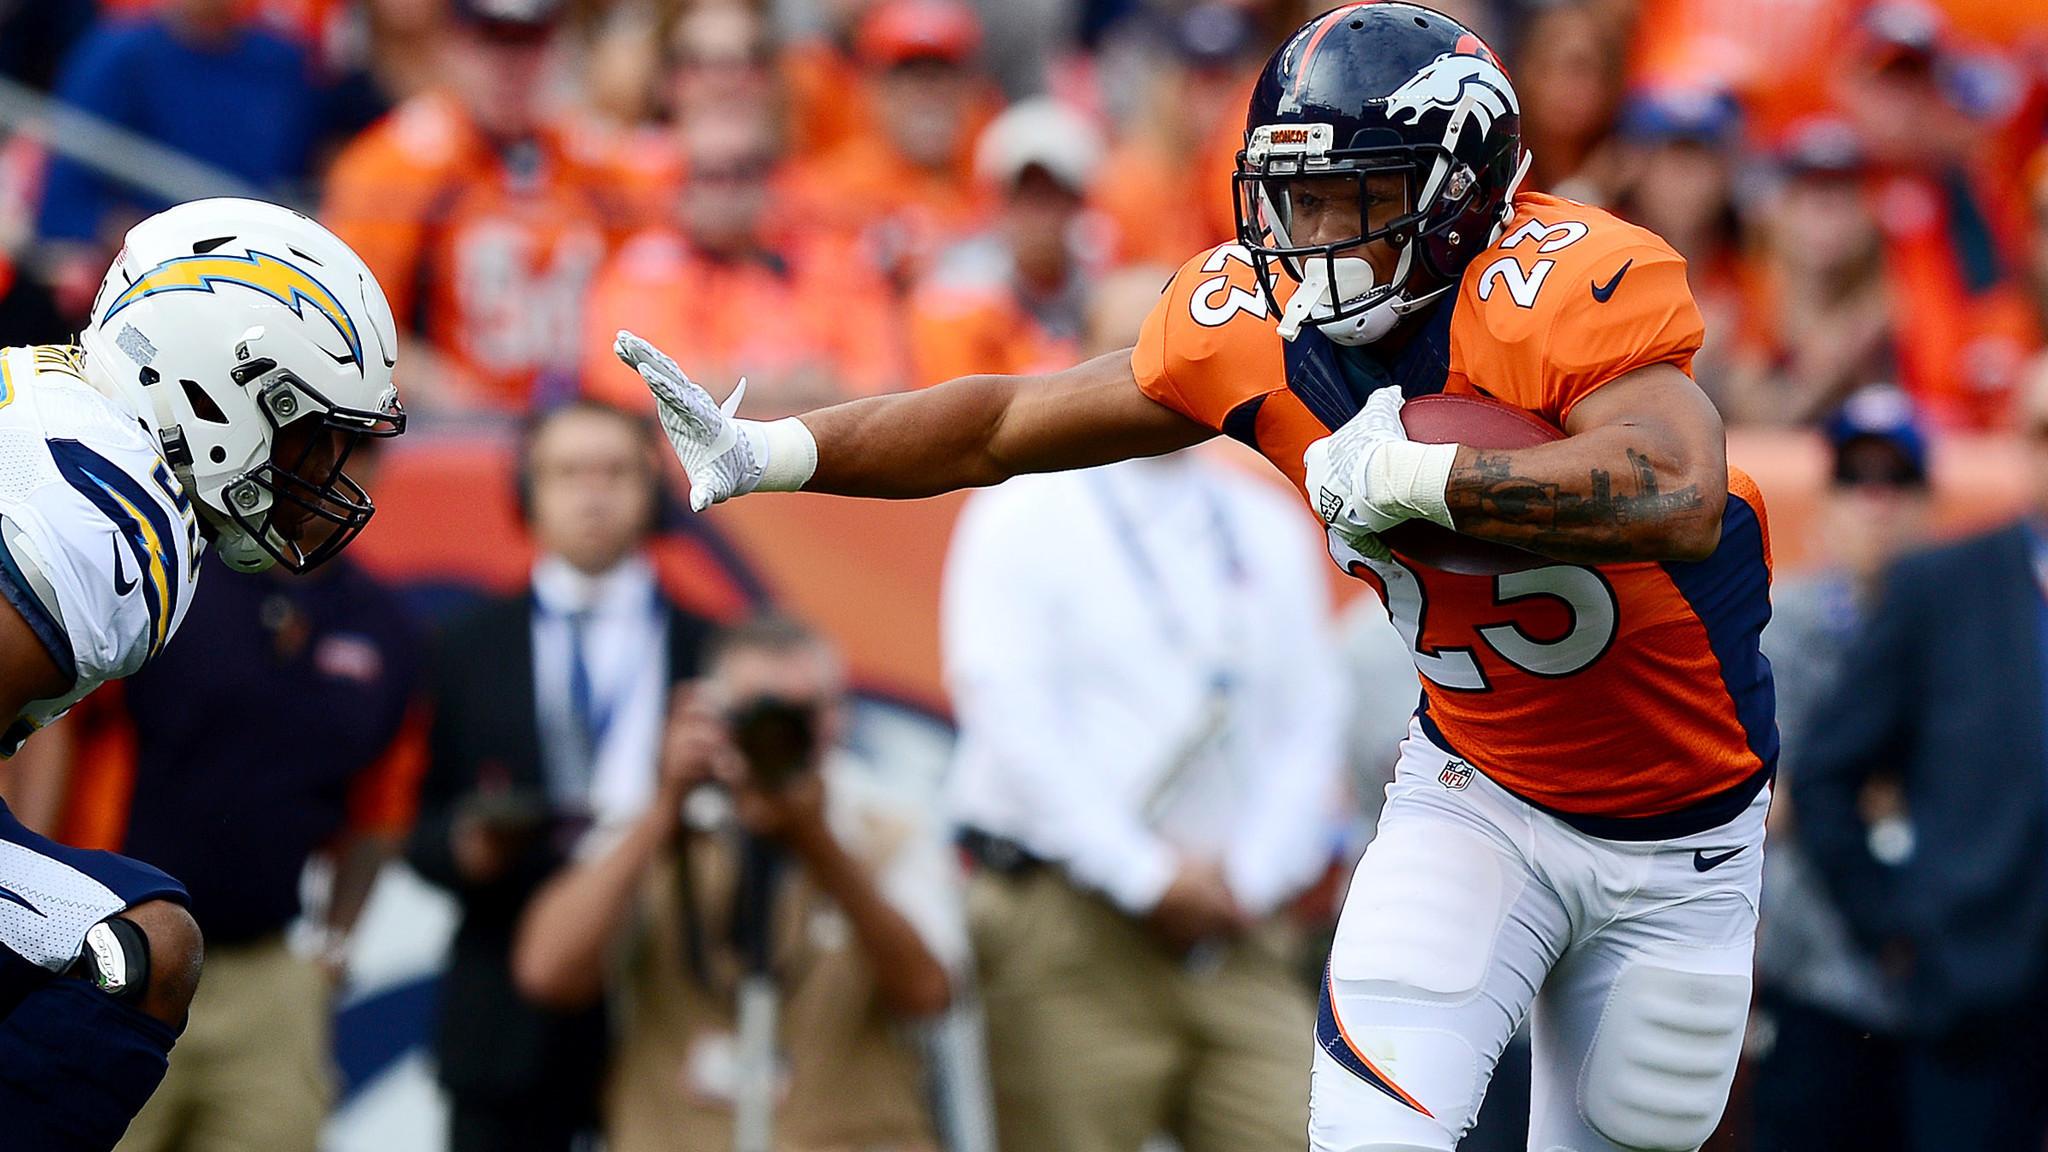 Nfl Notes Broncos Lose Devontae Booker To Wrist Injury